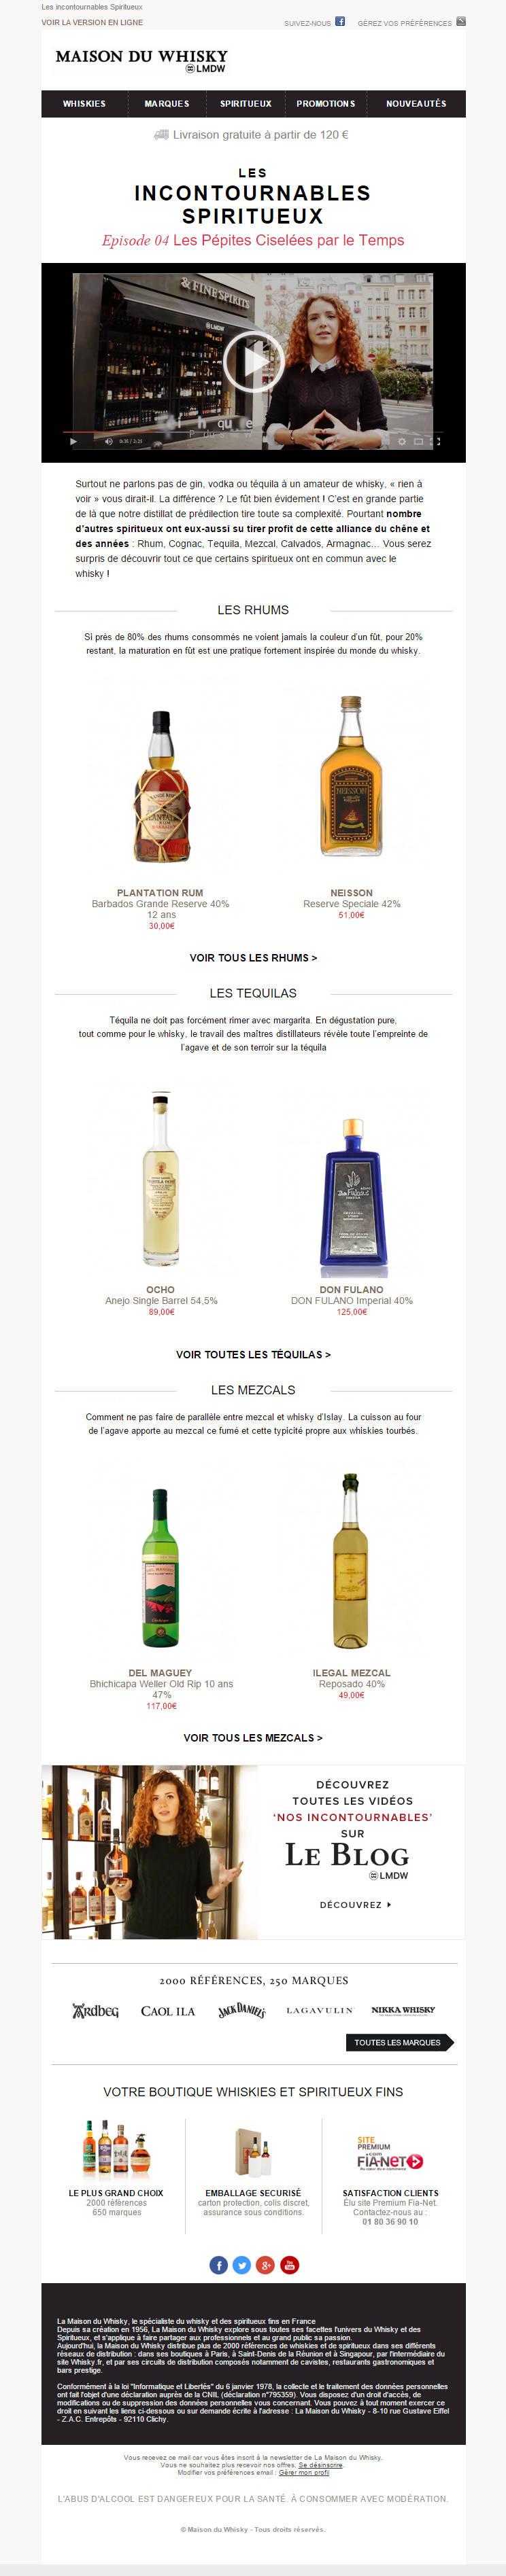 2016-01-17-maisonduwhisky-pc